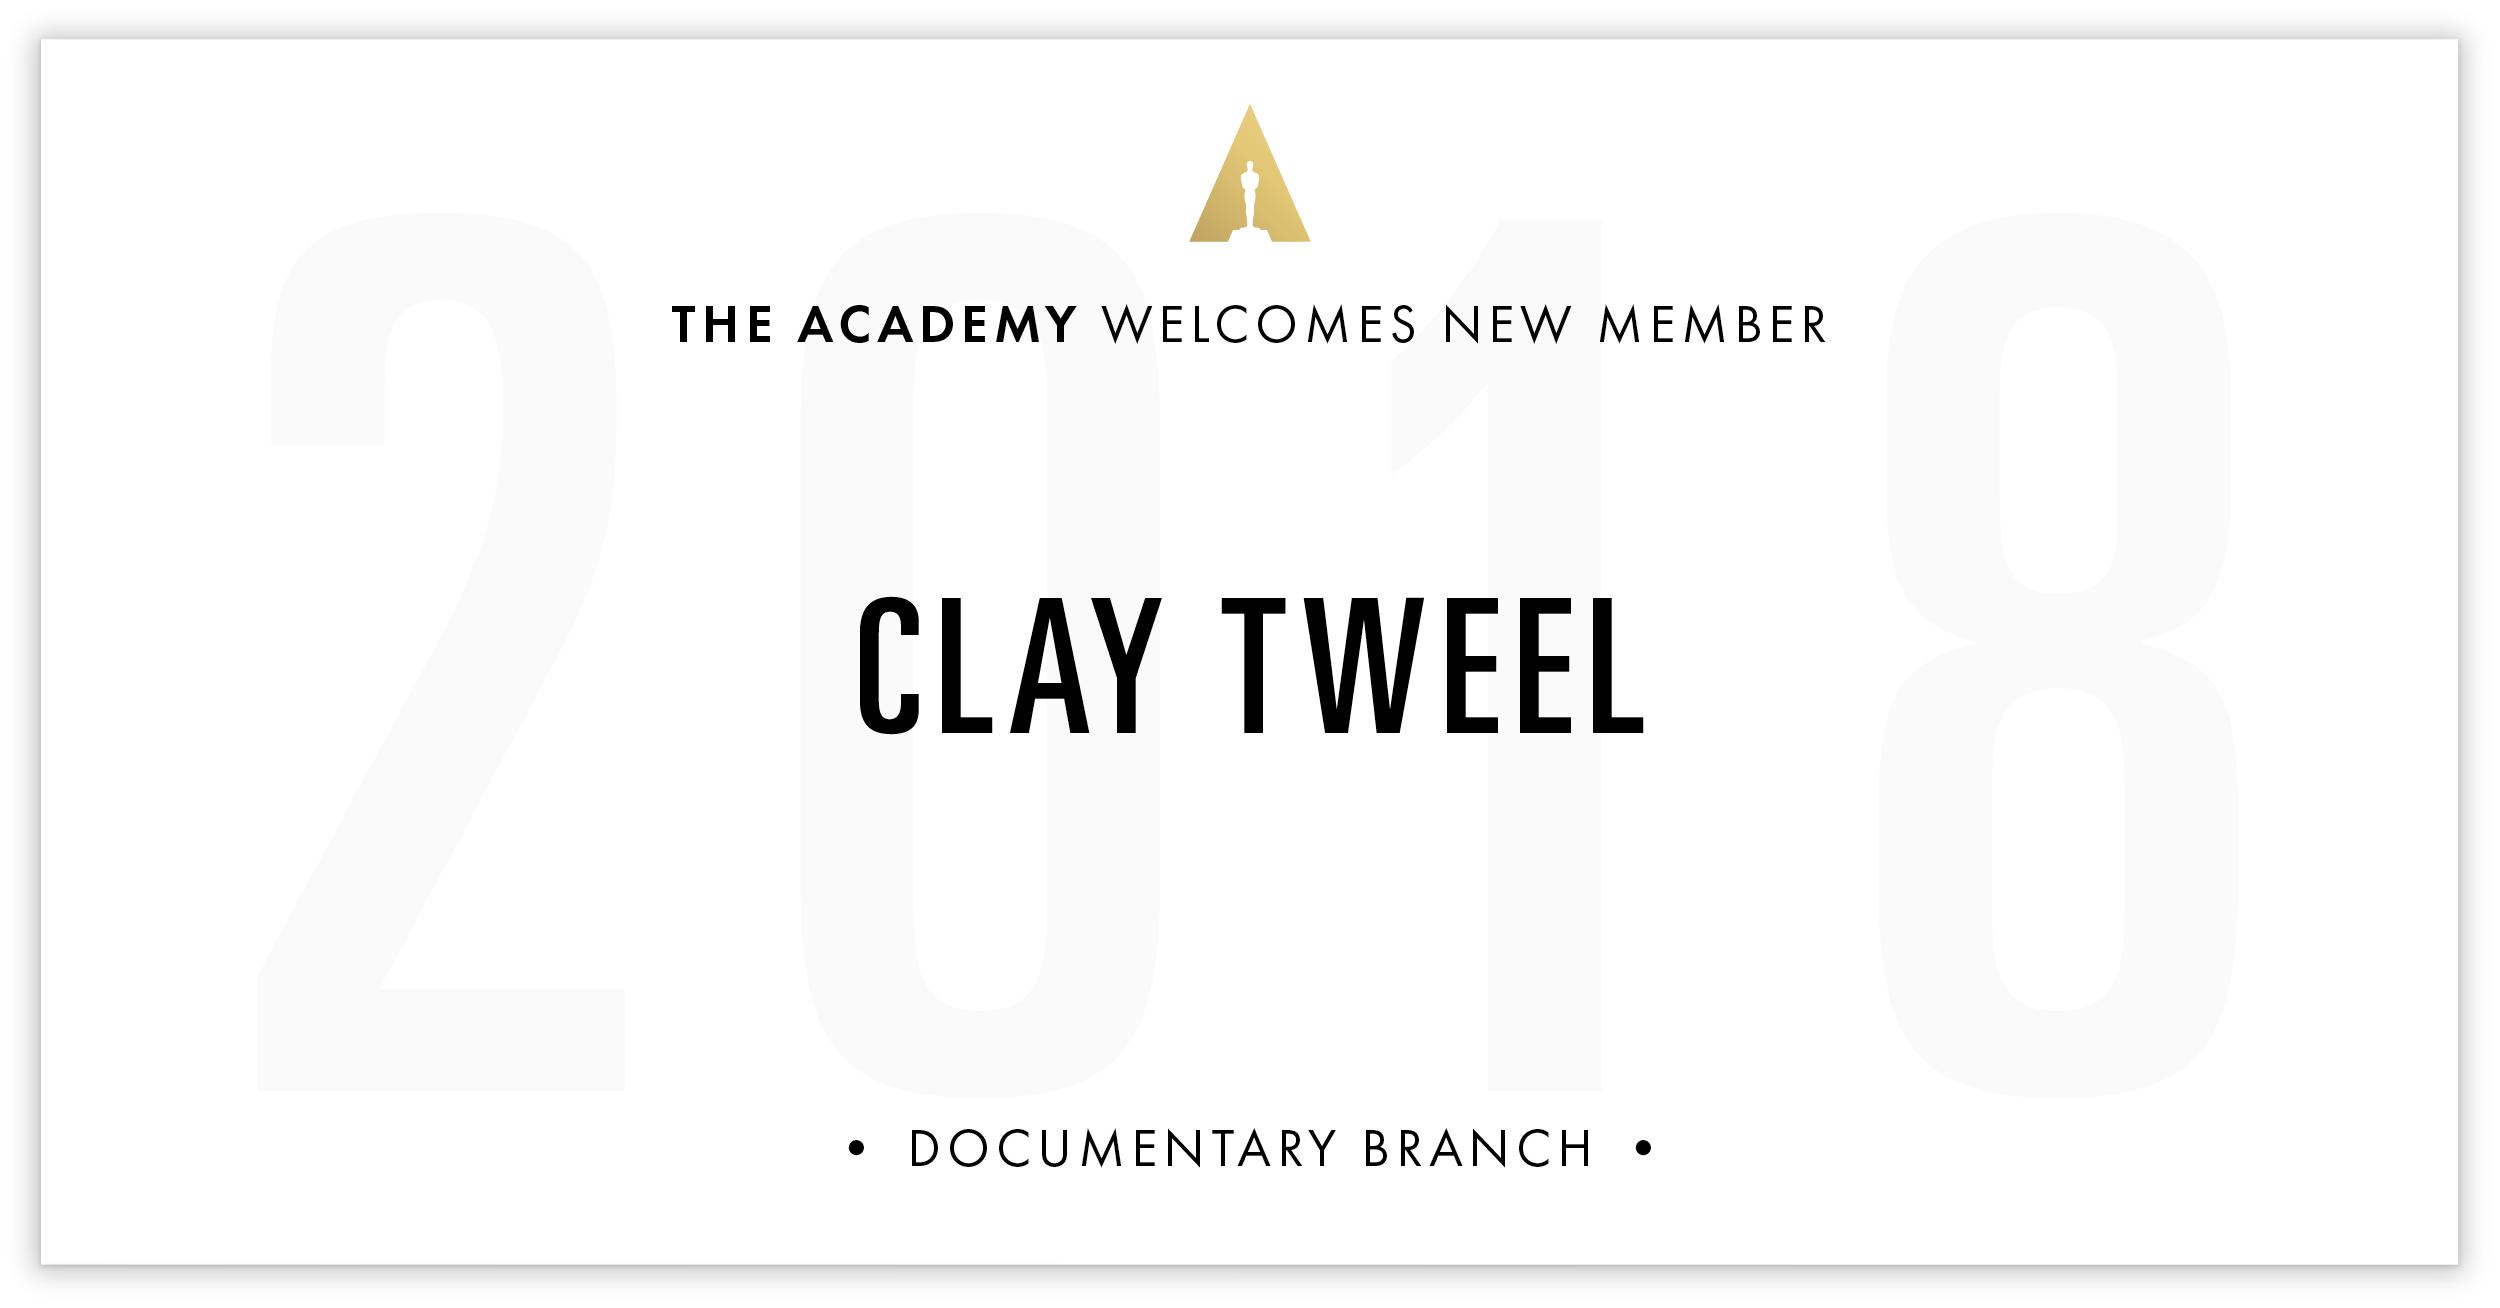 Clay Tweel is invited!